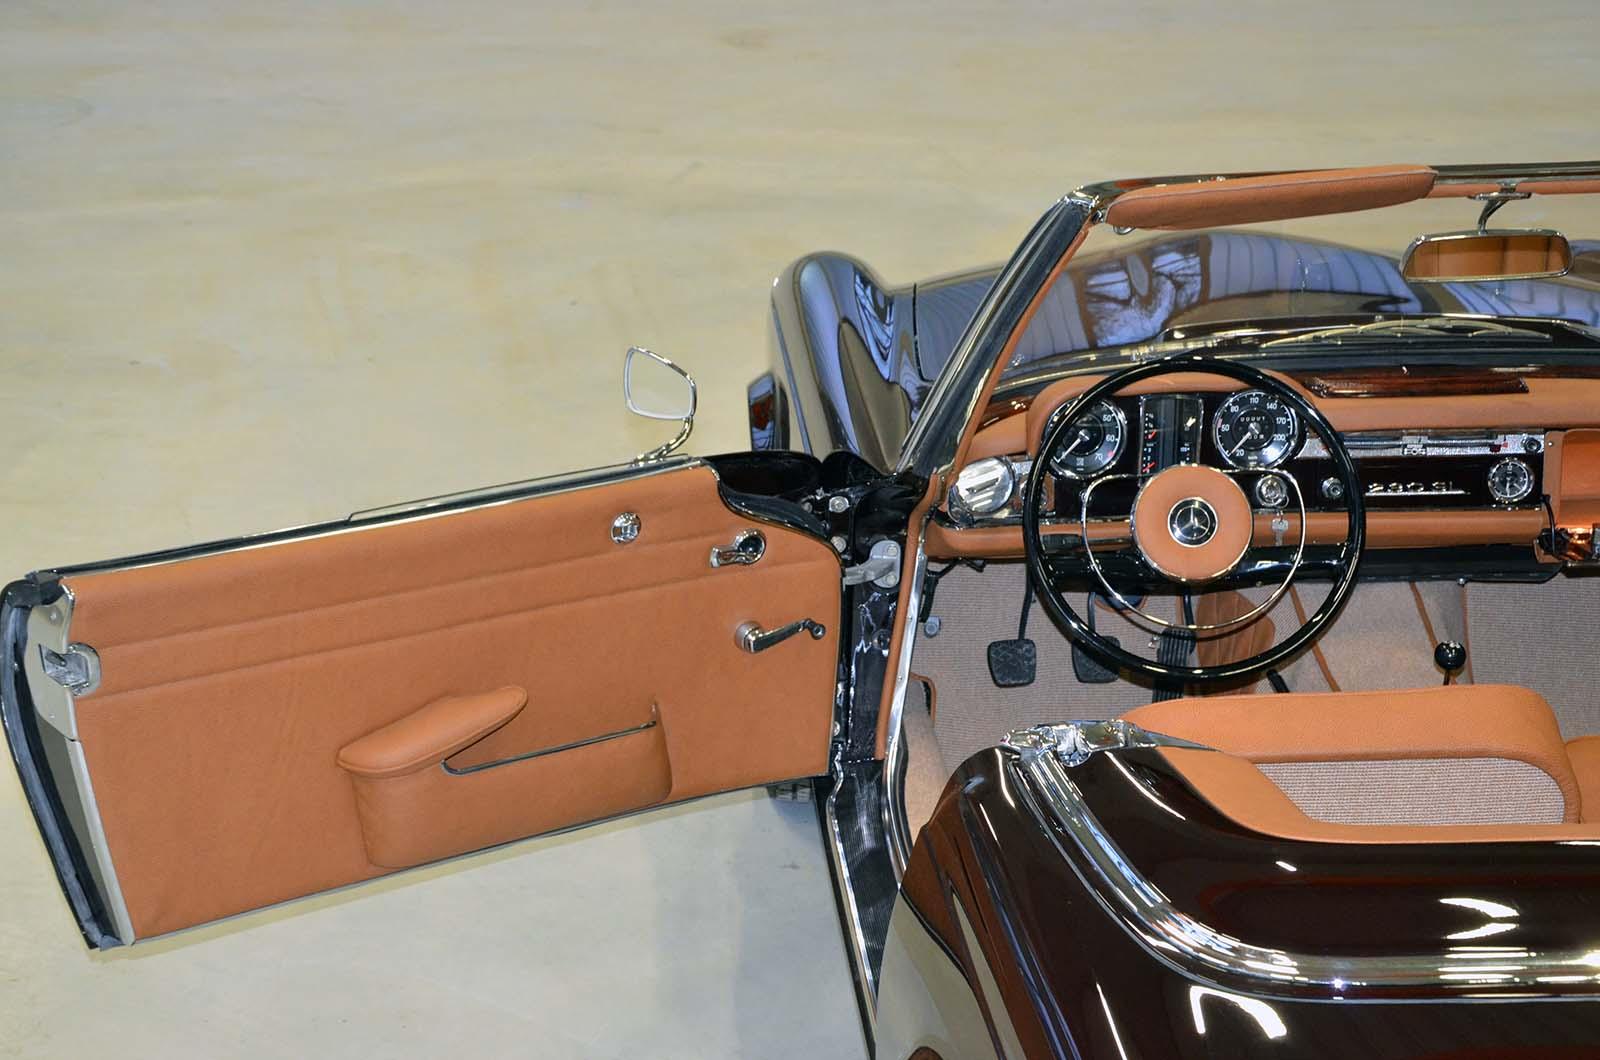 Mercedes W113 Pagoda 230 SL barna, pezsgő